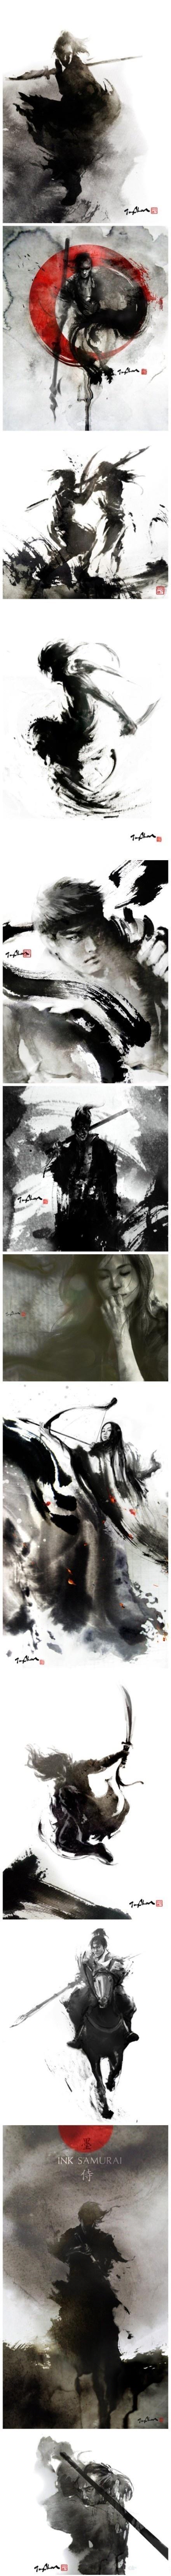 Ink samurais